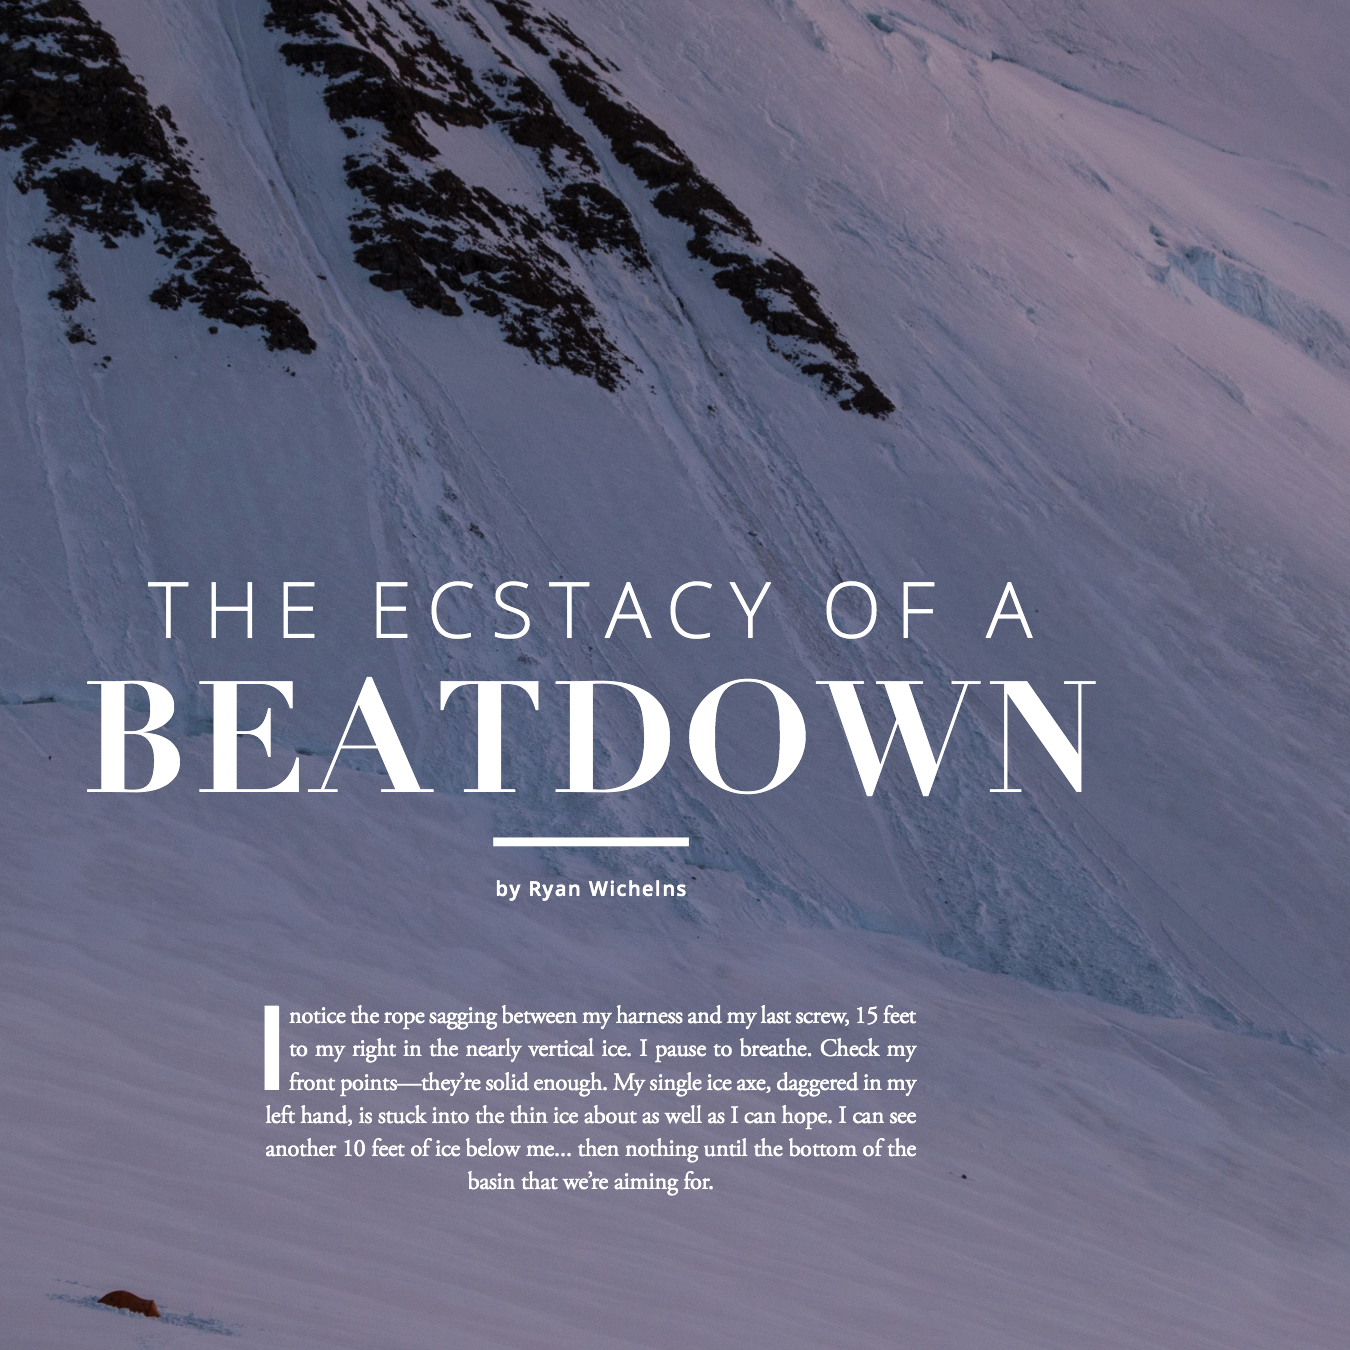 The Ecstasy of a Beatdown   American Alpine Club Guidebook to Membership — 2016